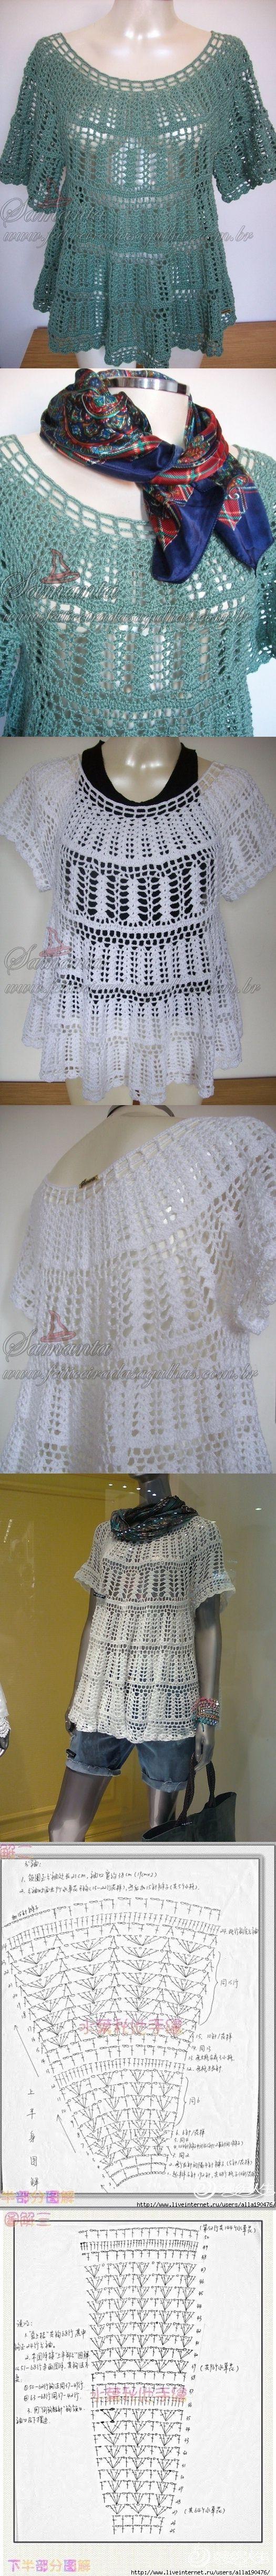 ... crochet tunic patterns crochet tank top free pattern charts diagrams